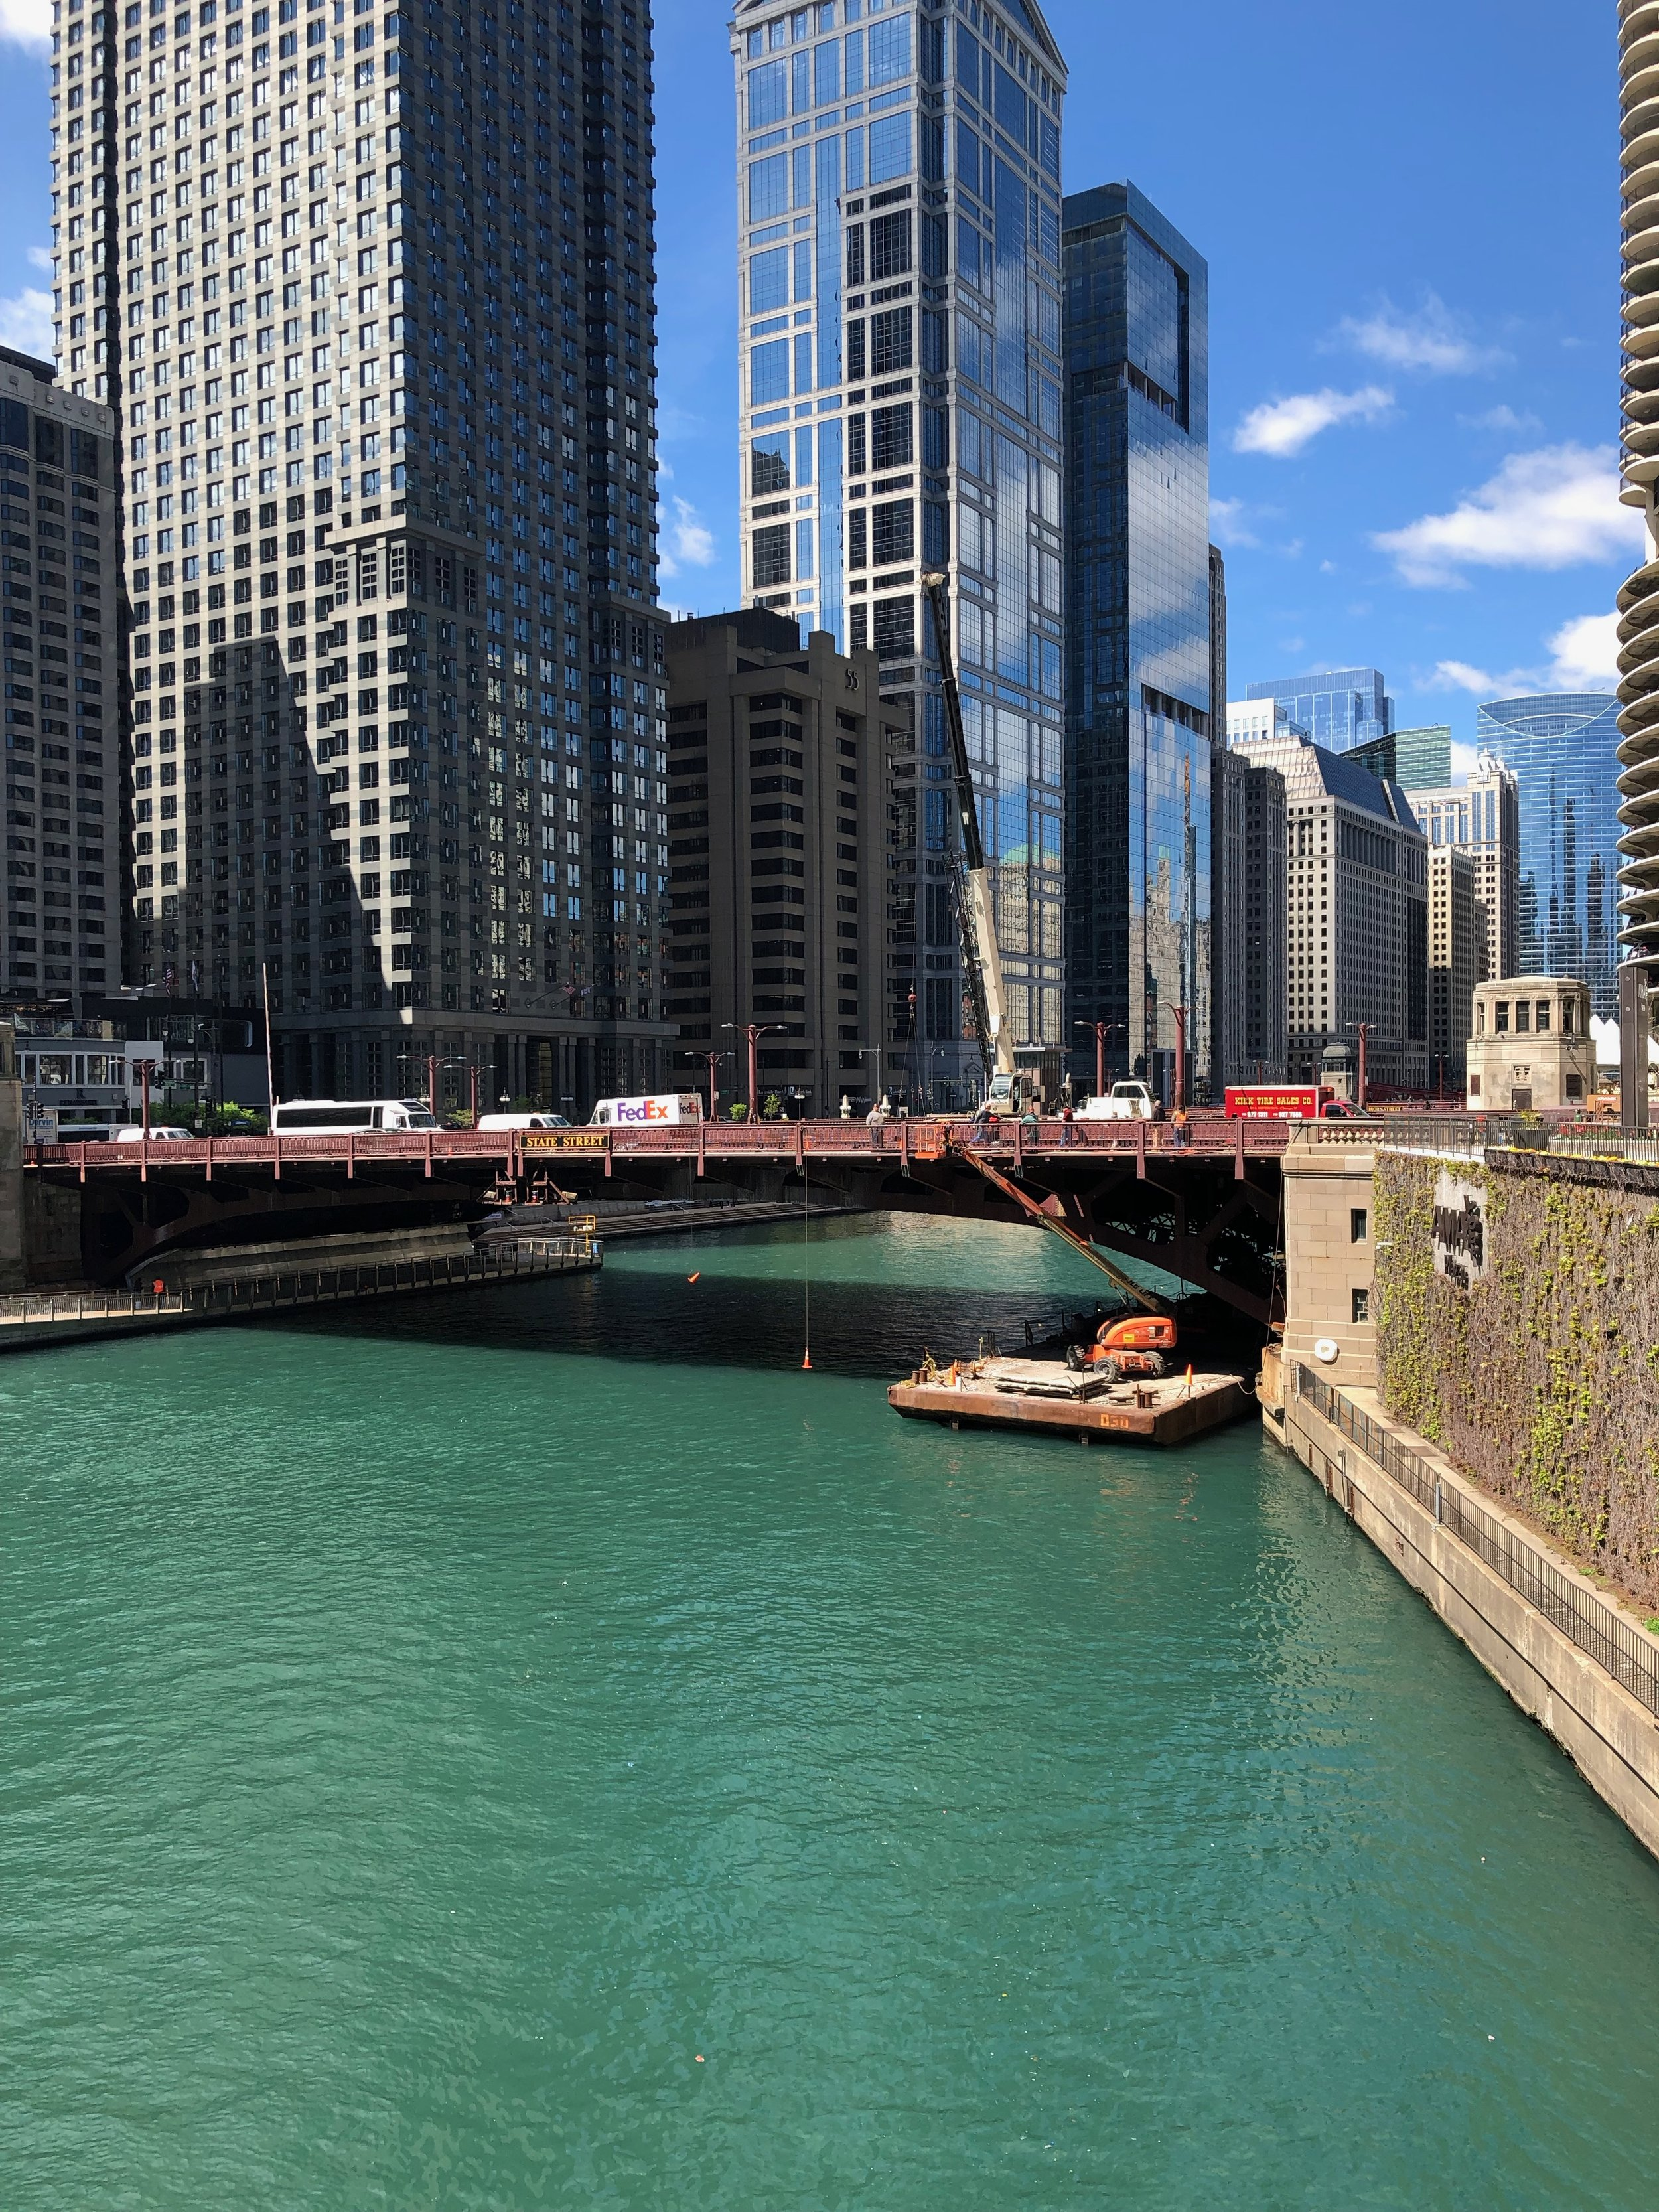 Chicago River at N. Clark